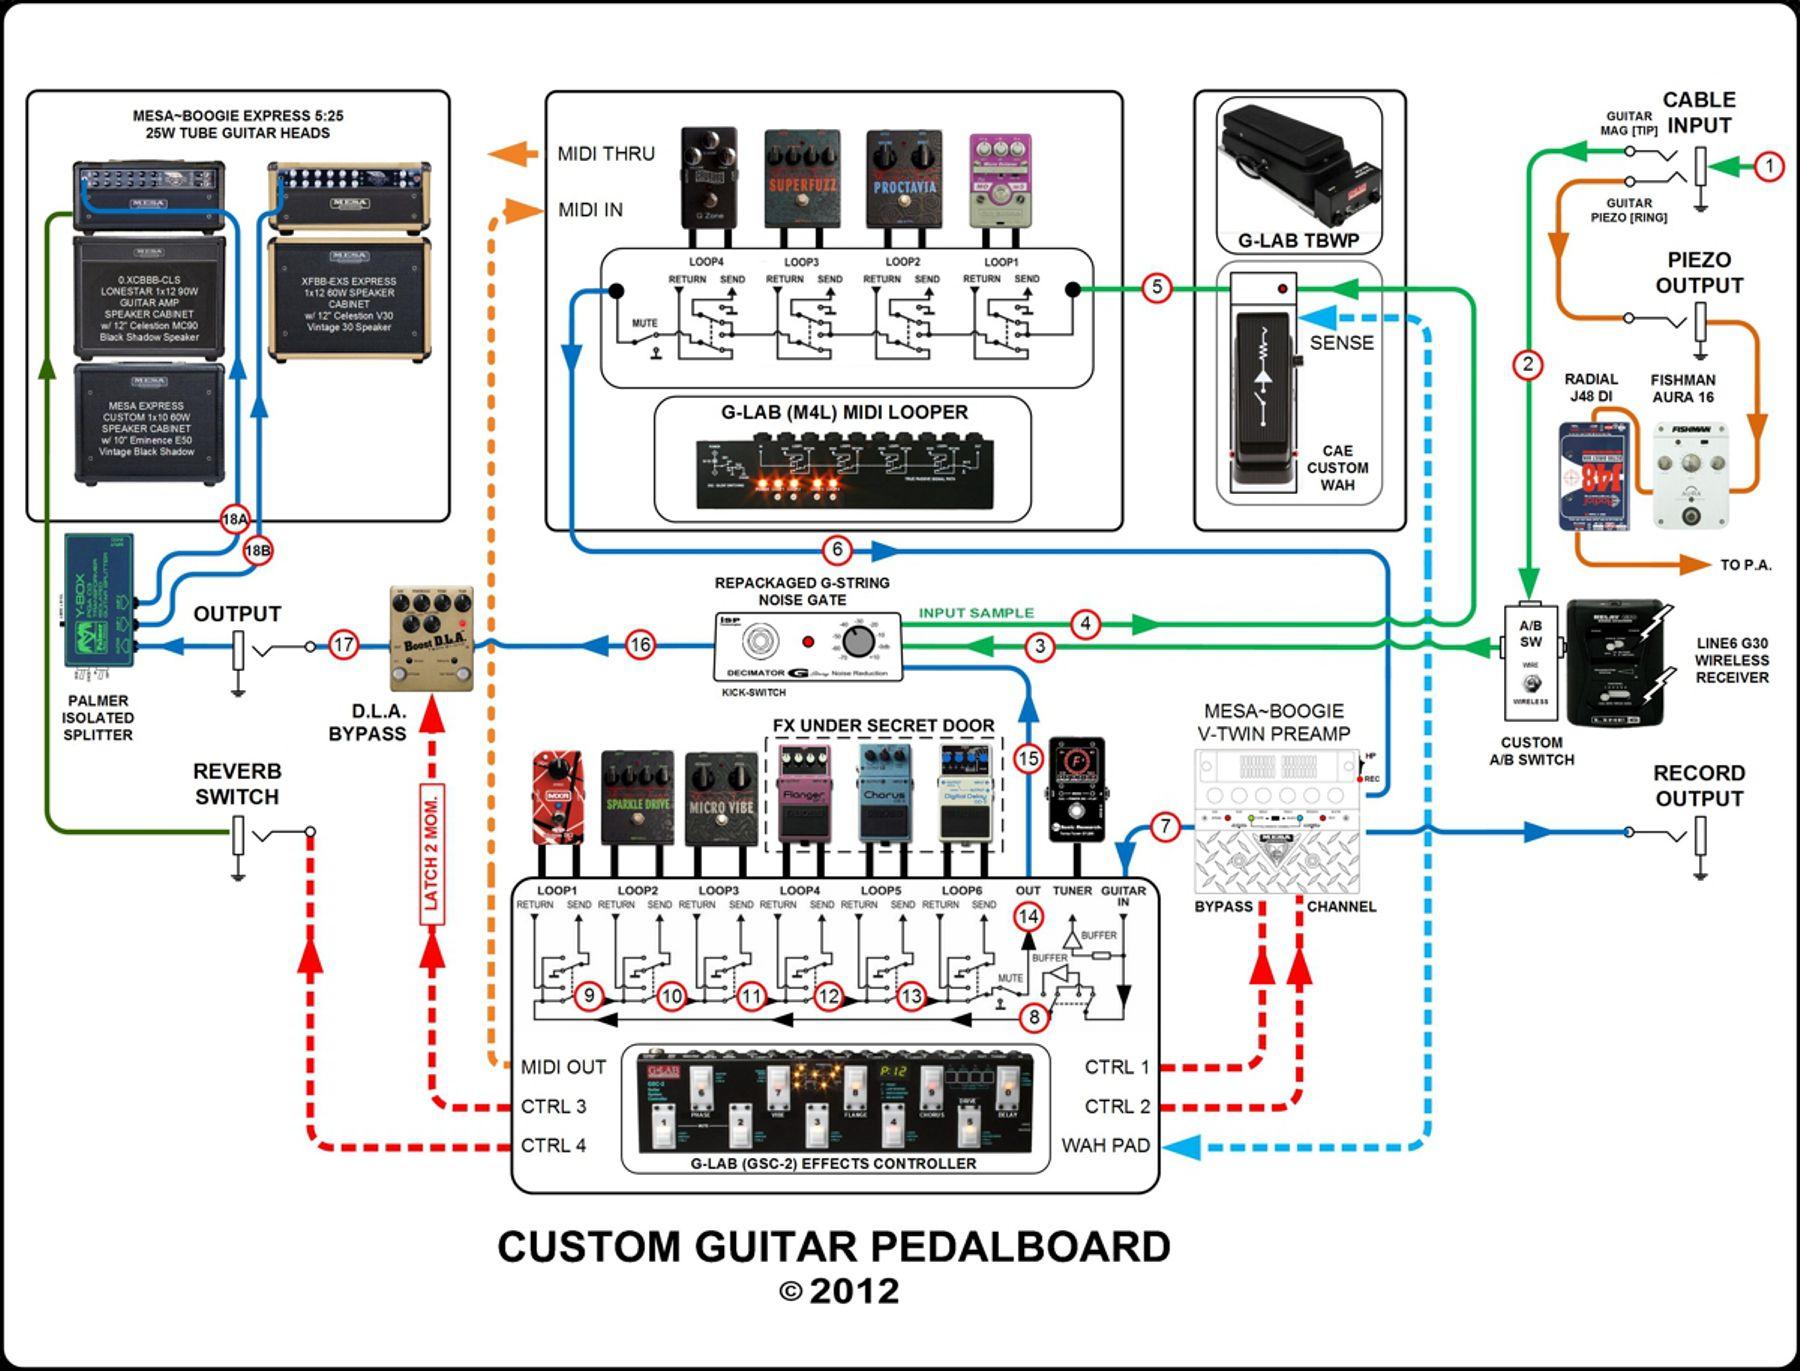 Diy Pedalboard Wiring Best Secret Diagram Guitar Amp Speakers Pedal Board Circuit And Schematics Amplifier